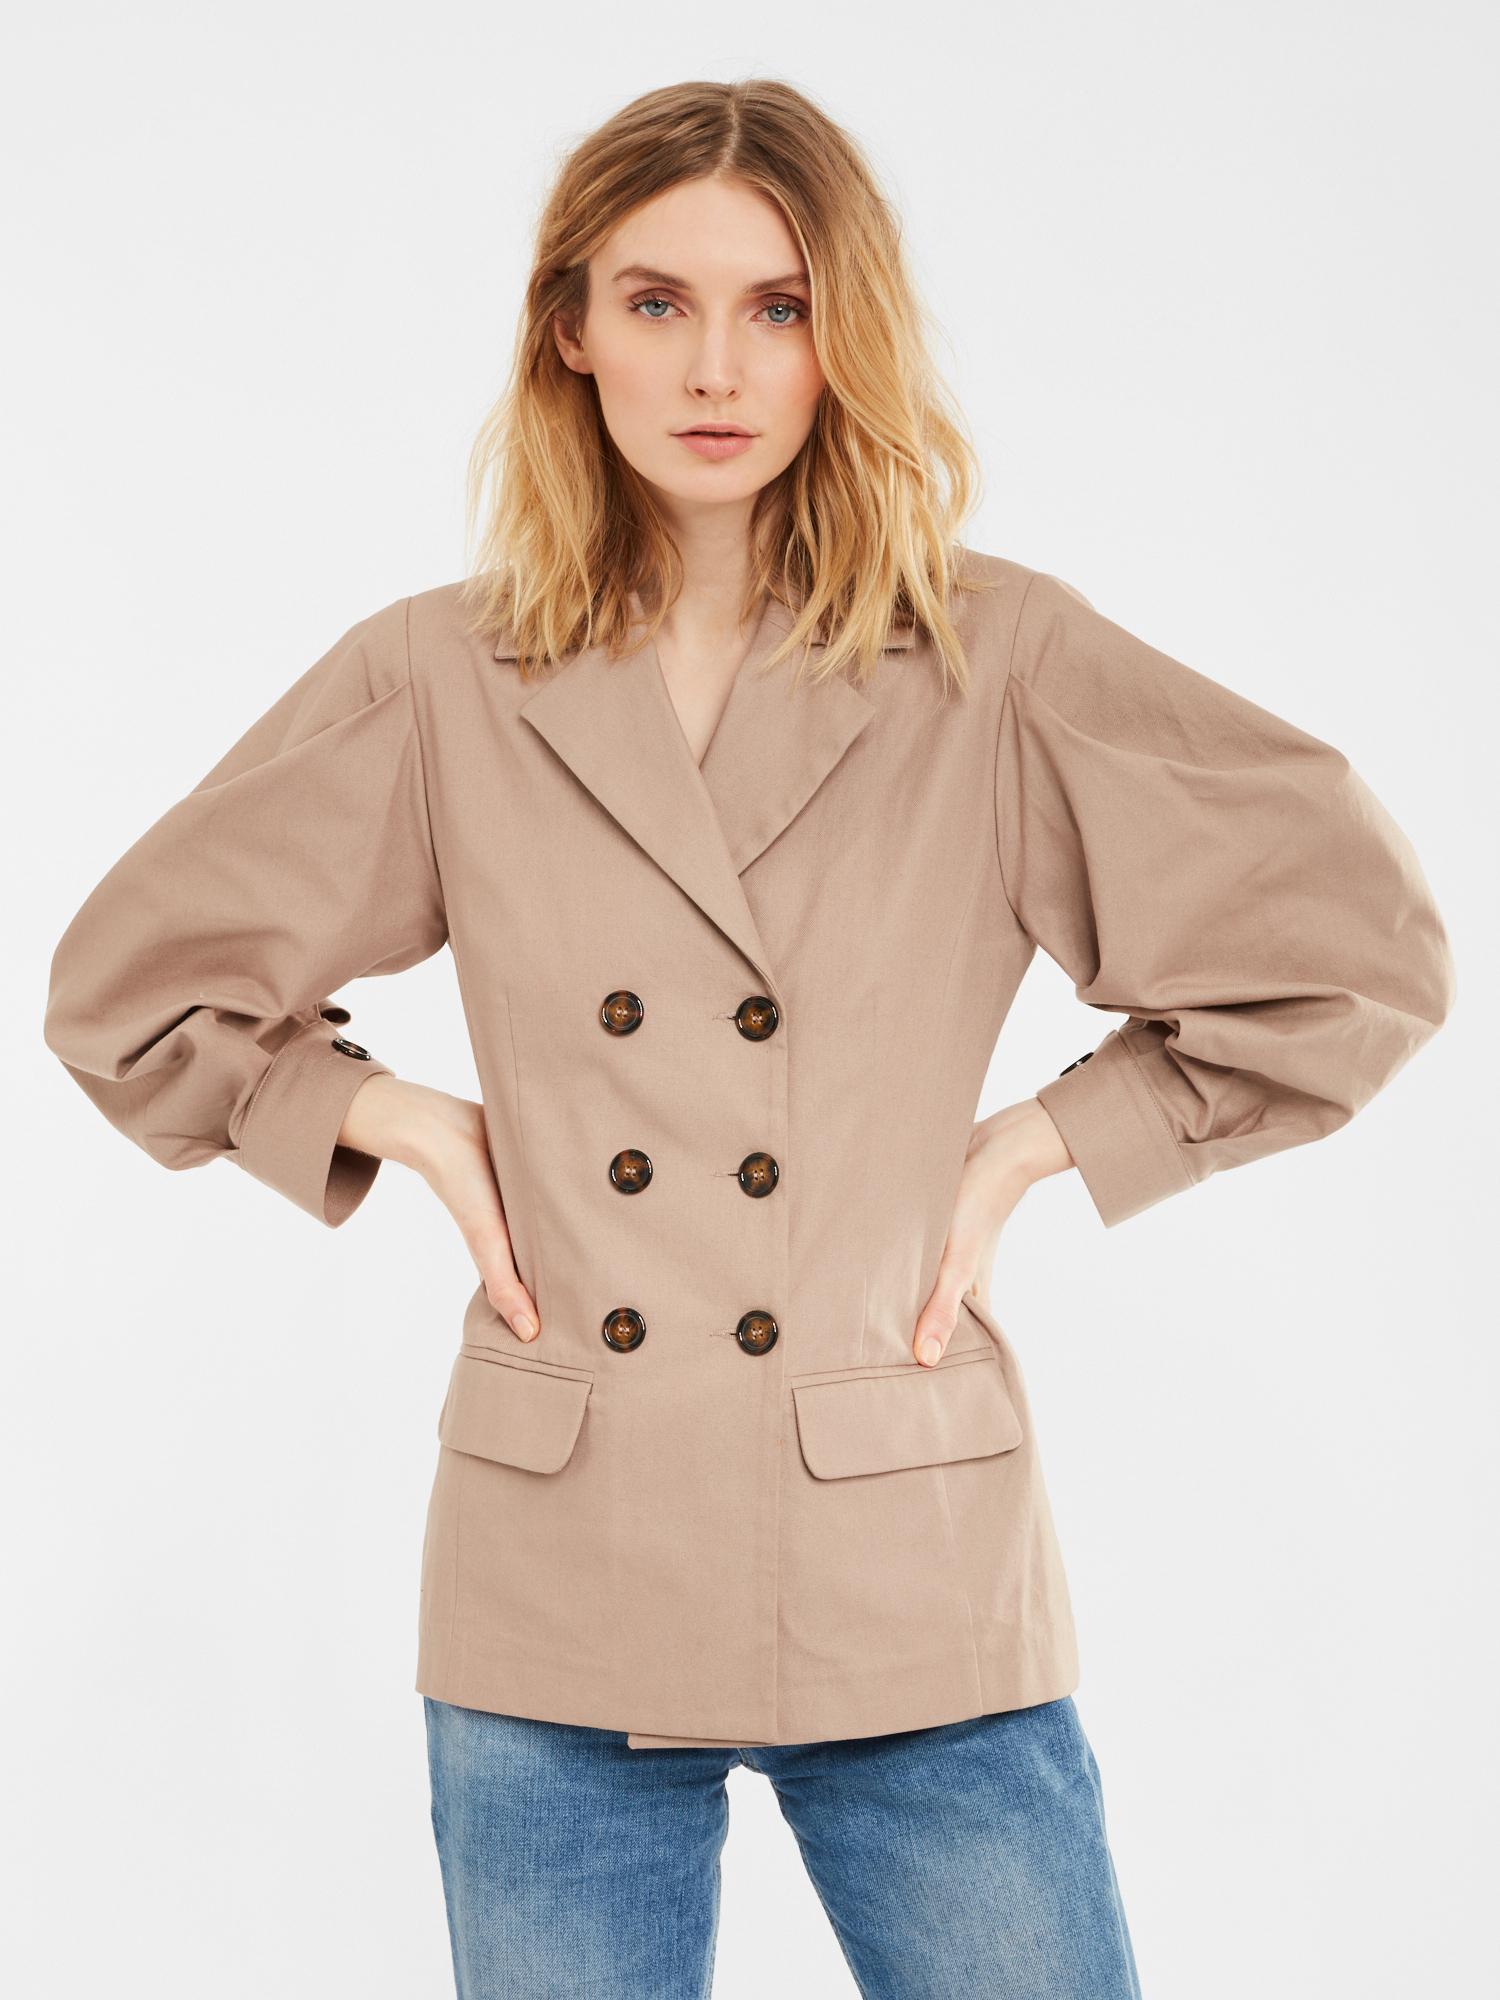 Neu im Shop: Blazer Jacket